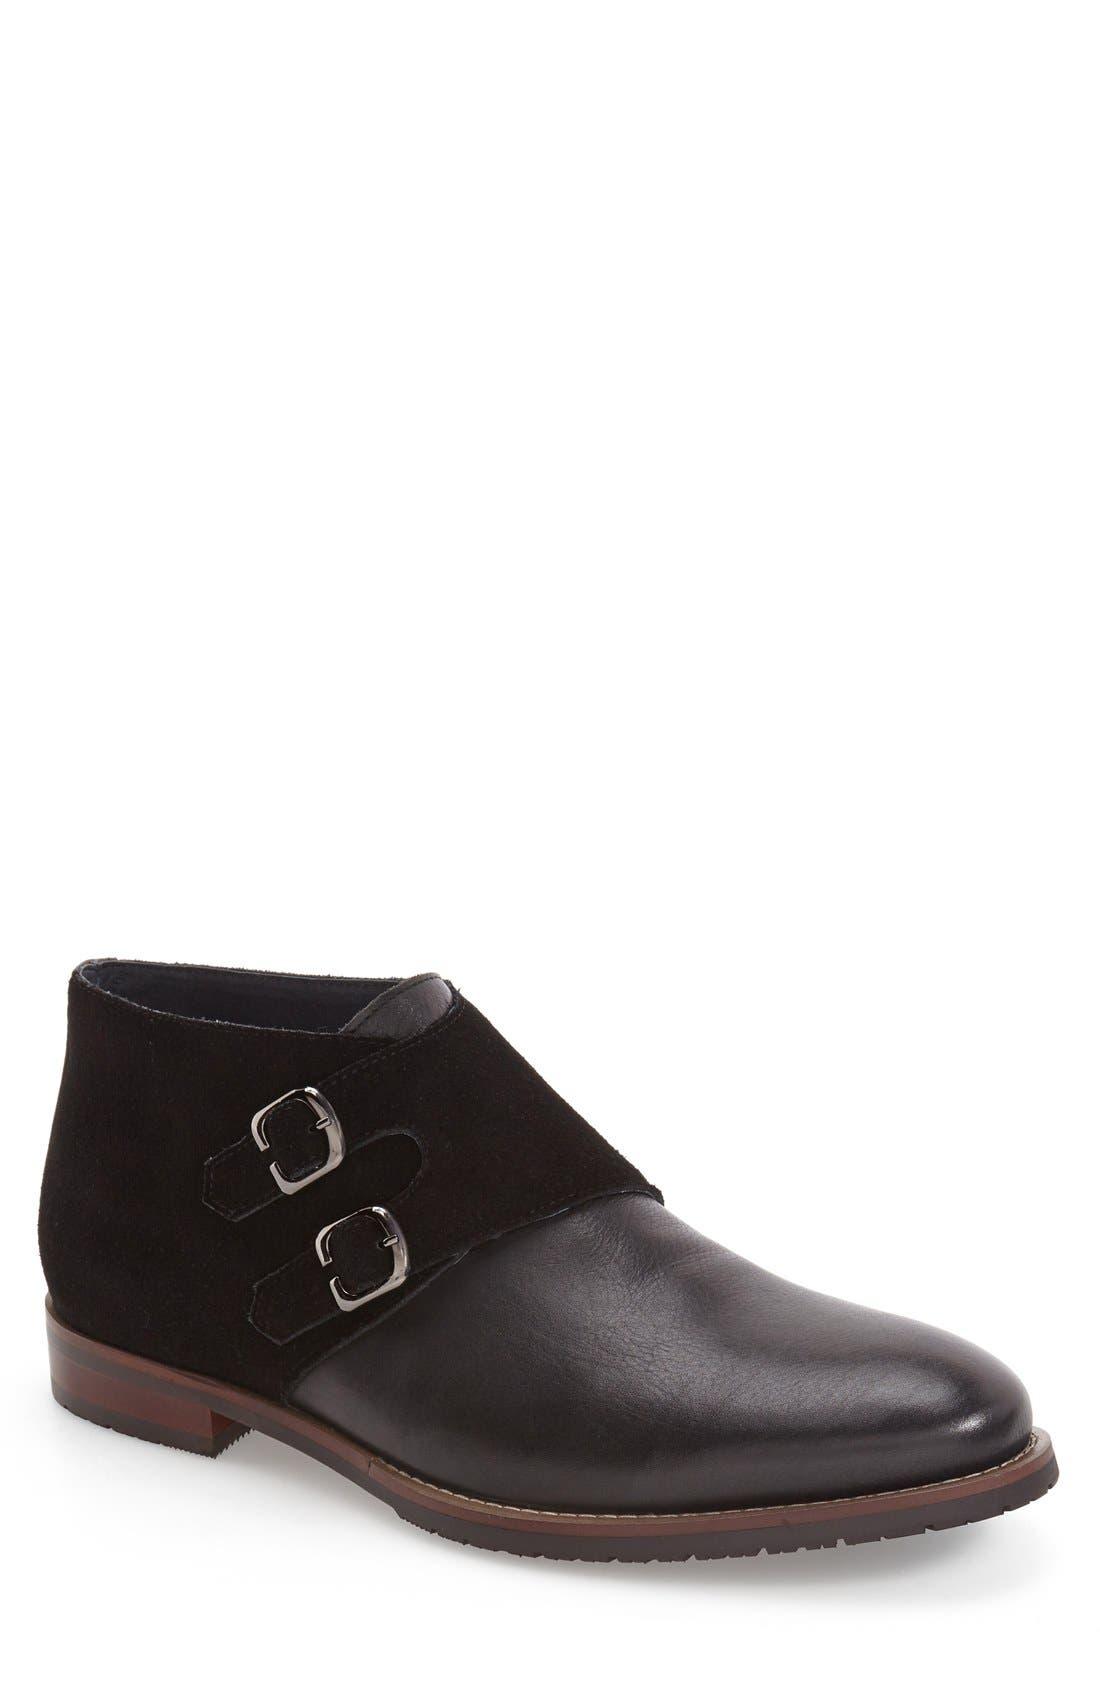 Main Image - Zanzara 'Napoli' Double Monk Strap Shoe (Men)